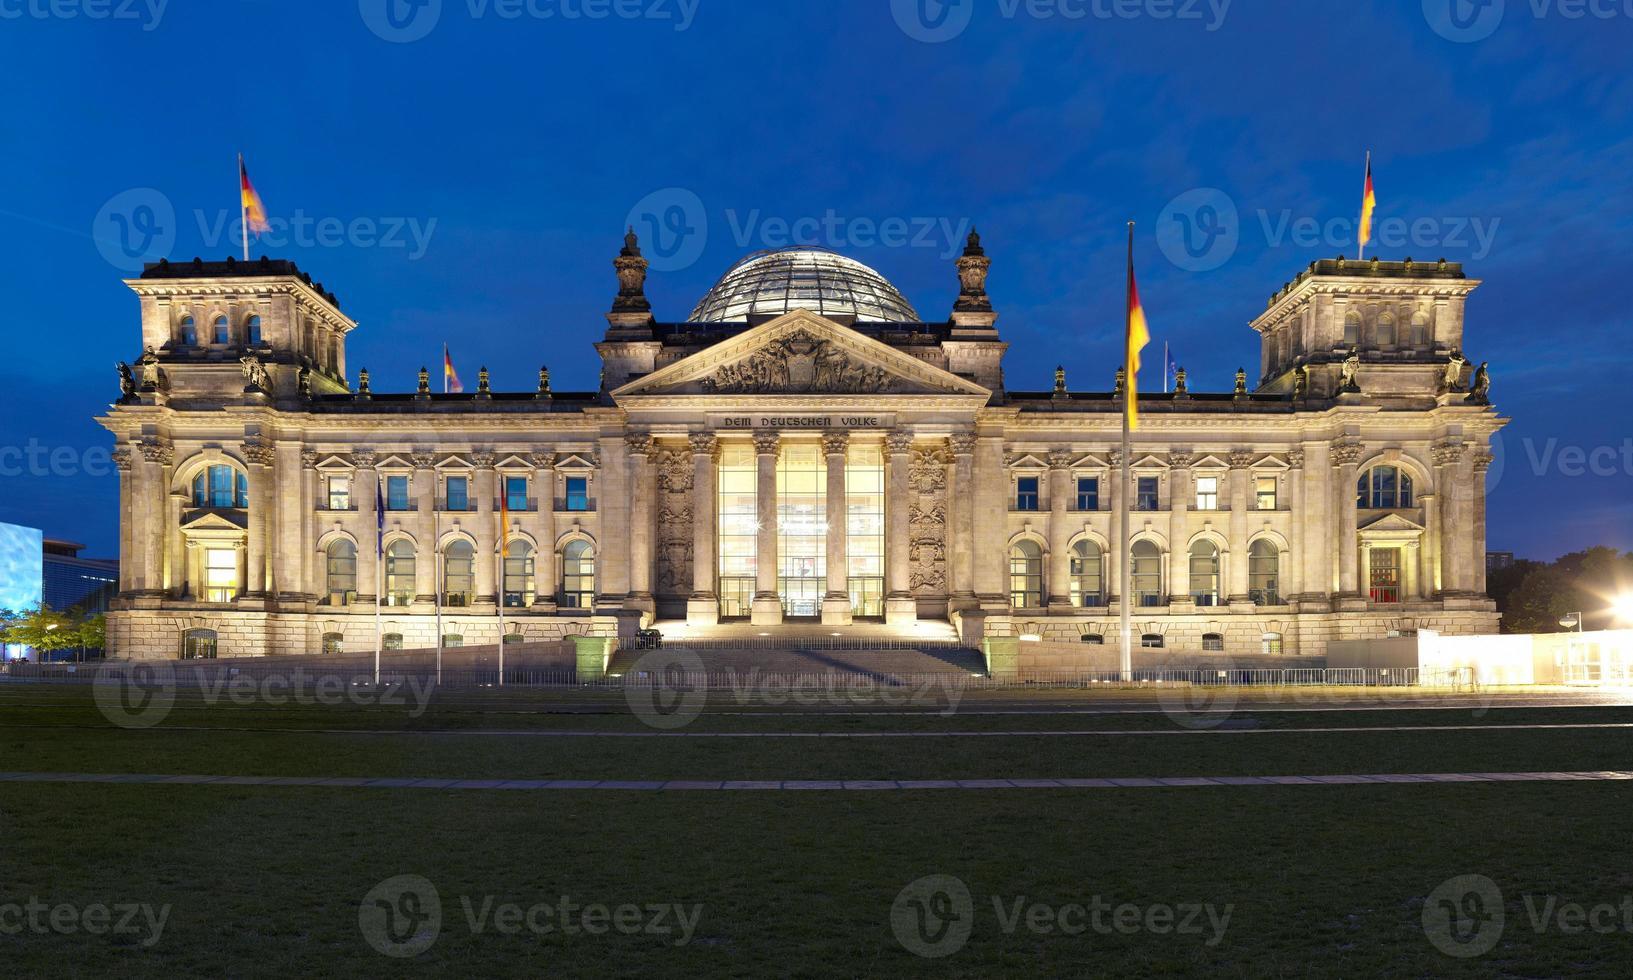 berlin reichstag, panoramablick bei nacht foto